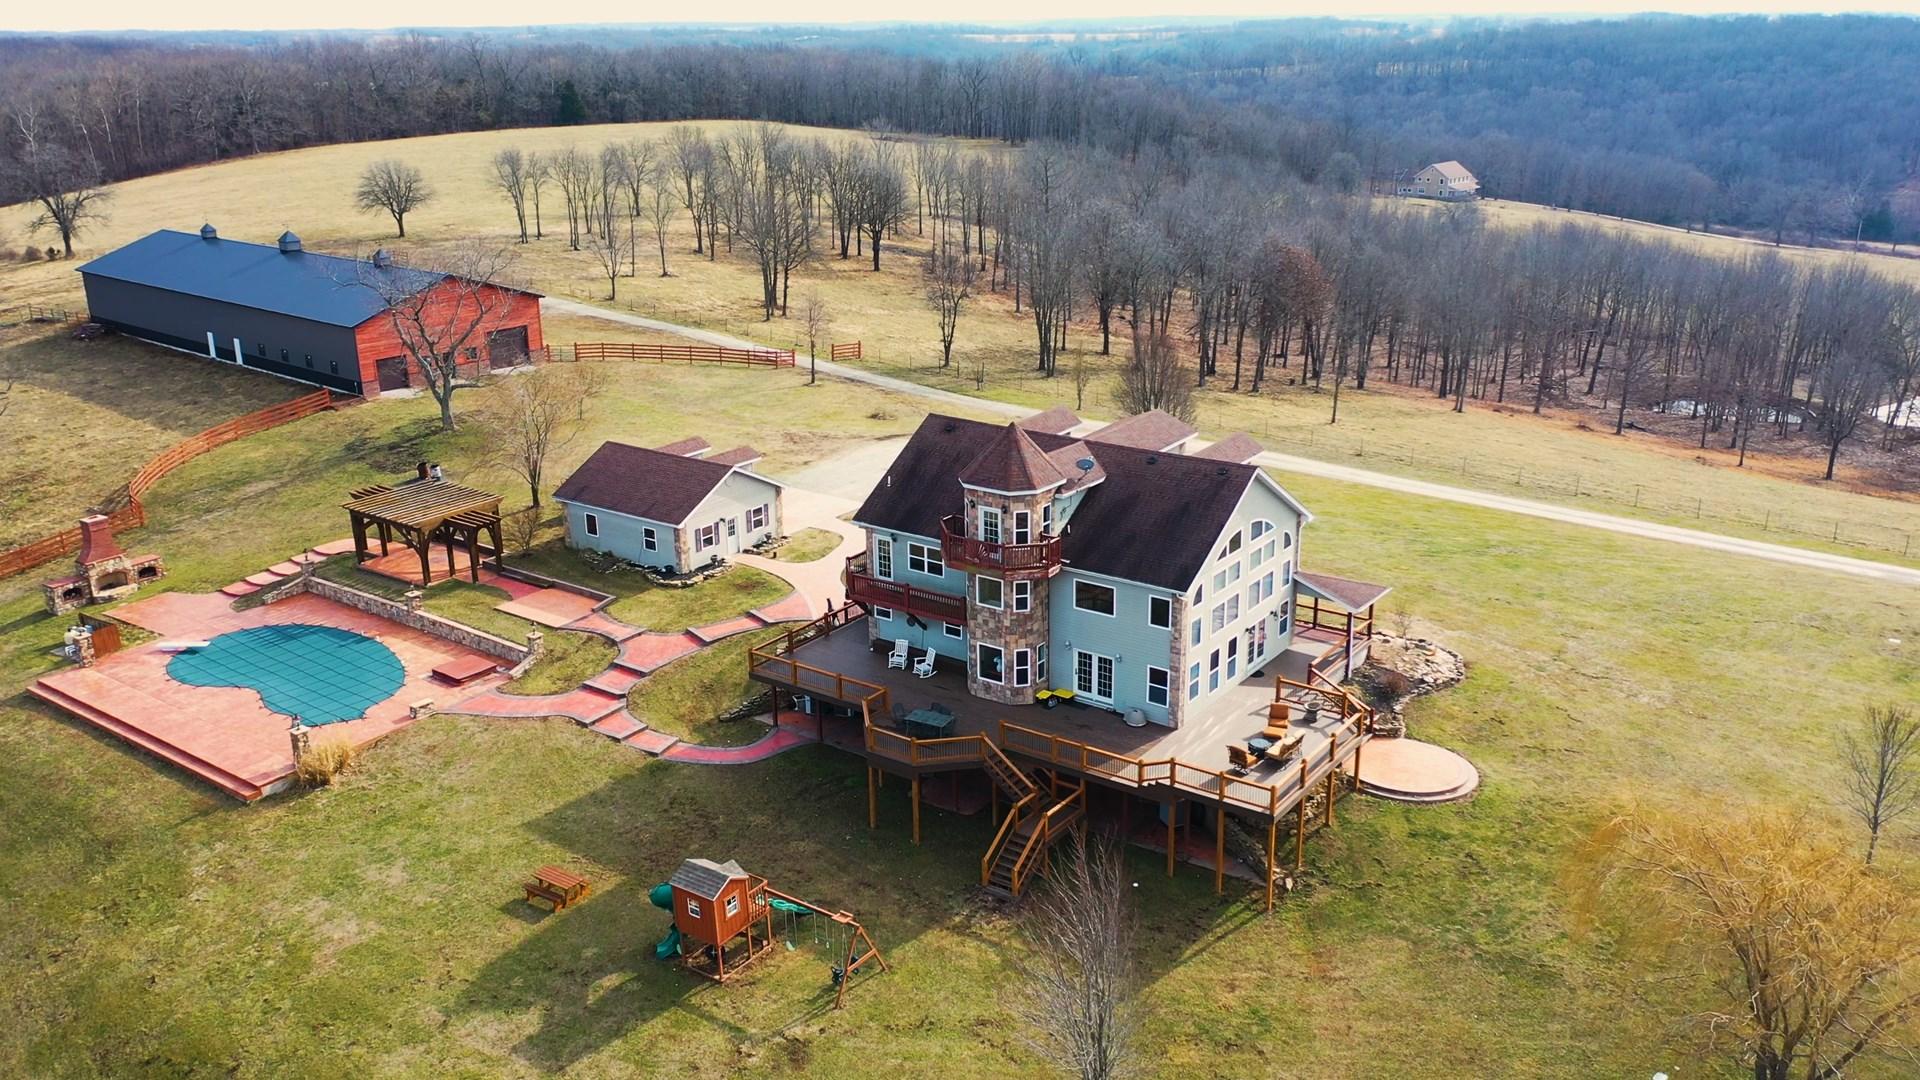 Southern Missouri Executive Home for Sale